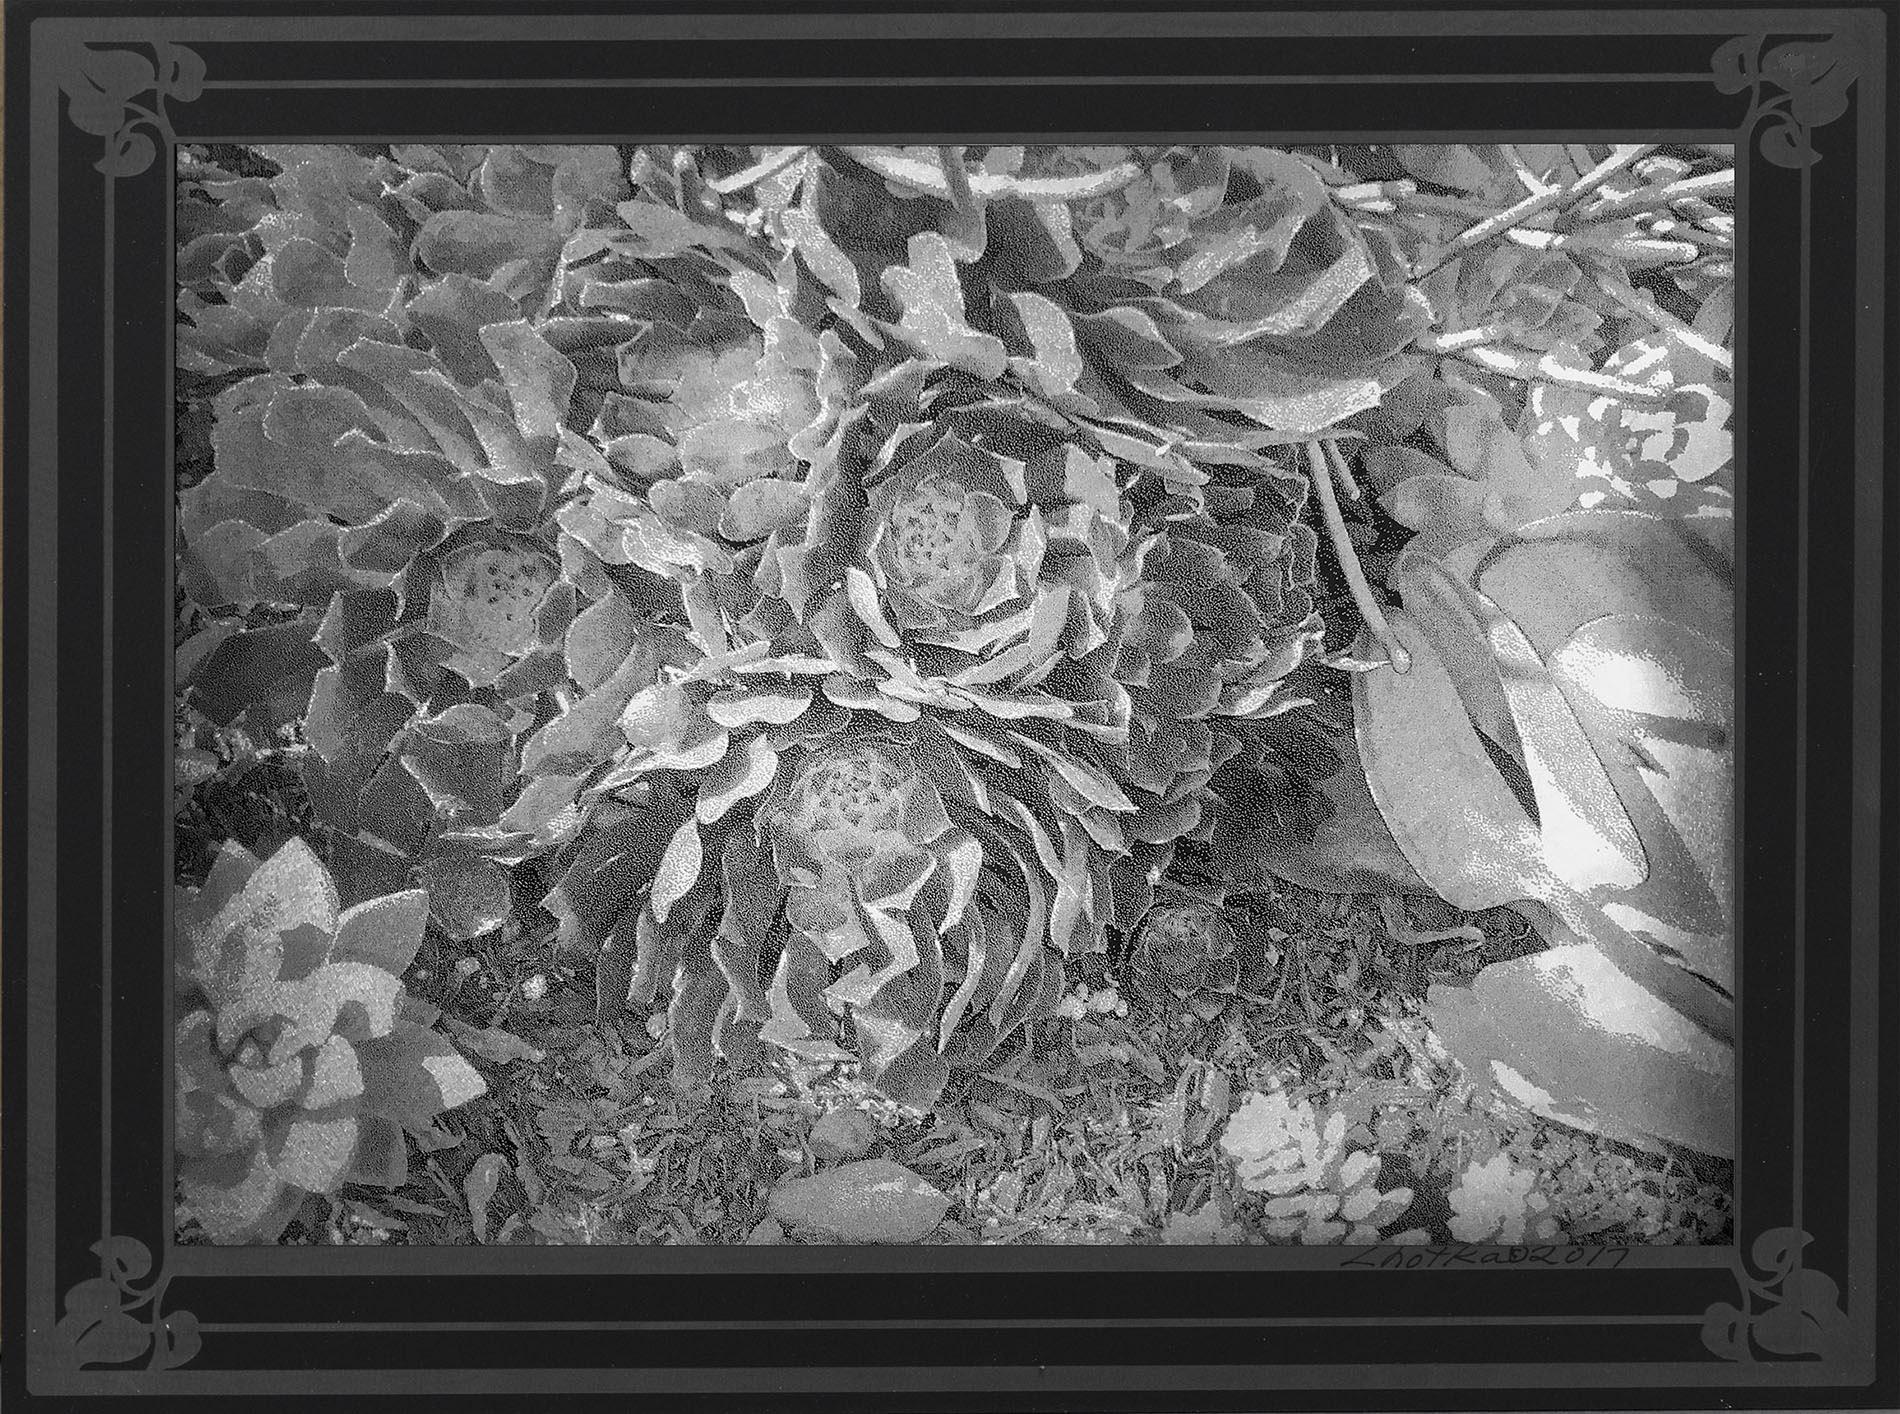 Detailed Garden  9 x 12  caustigram mounted on laser engraved acrylic